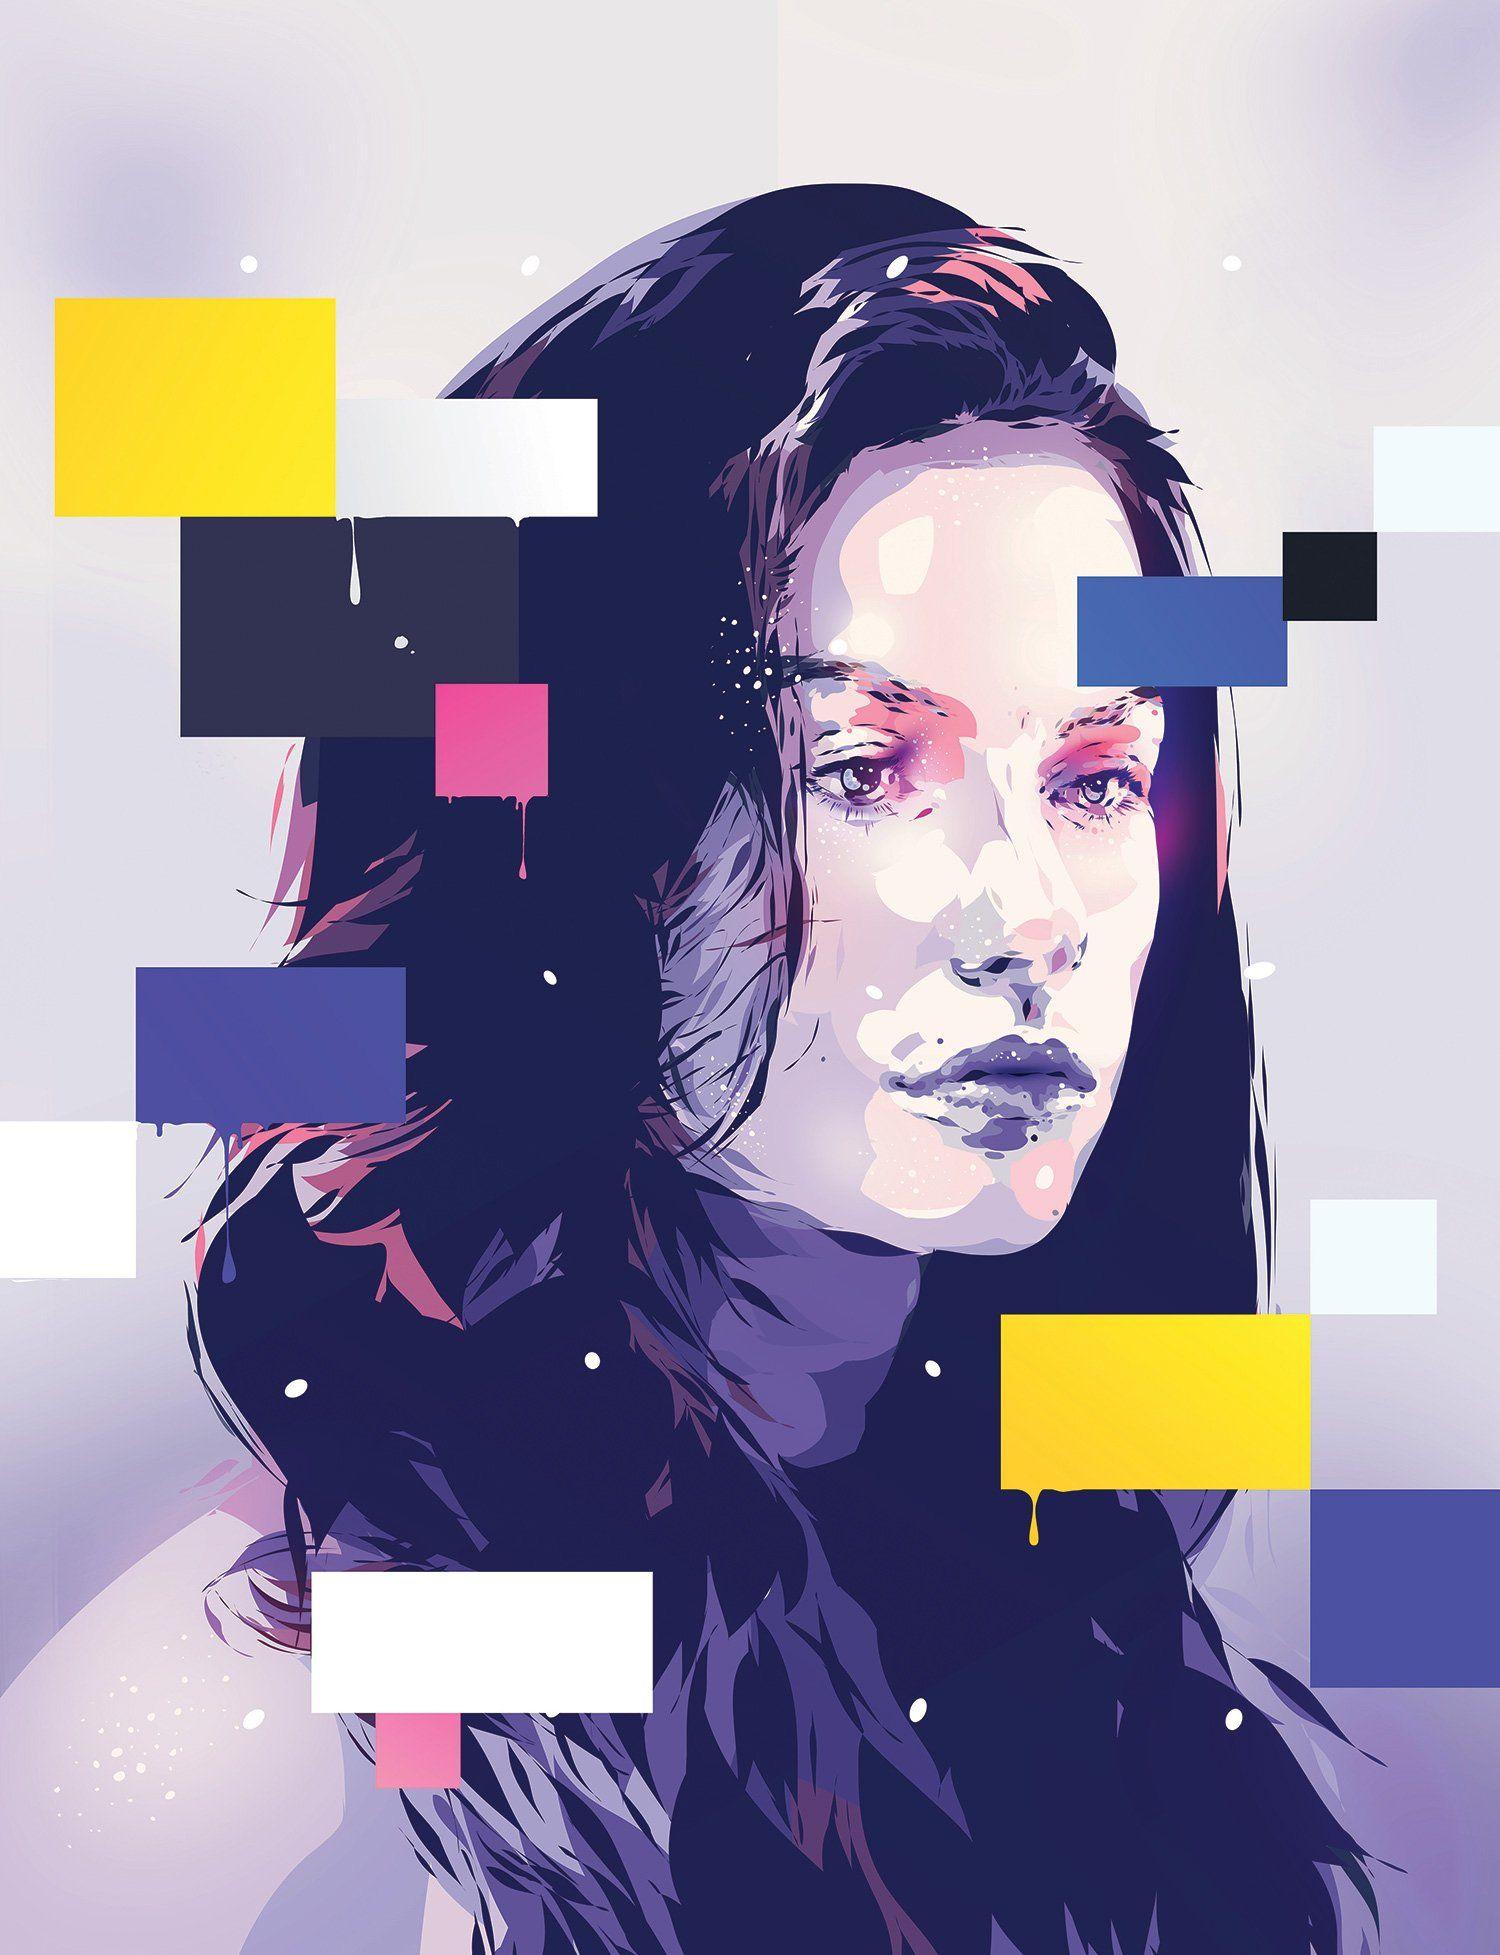 Adobe Illustrator - And Bit Of